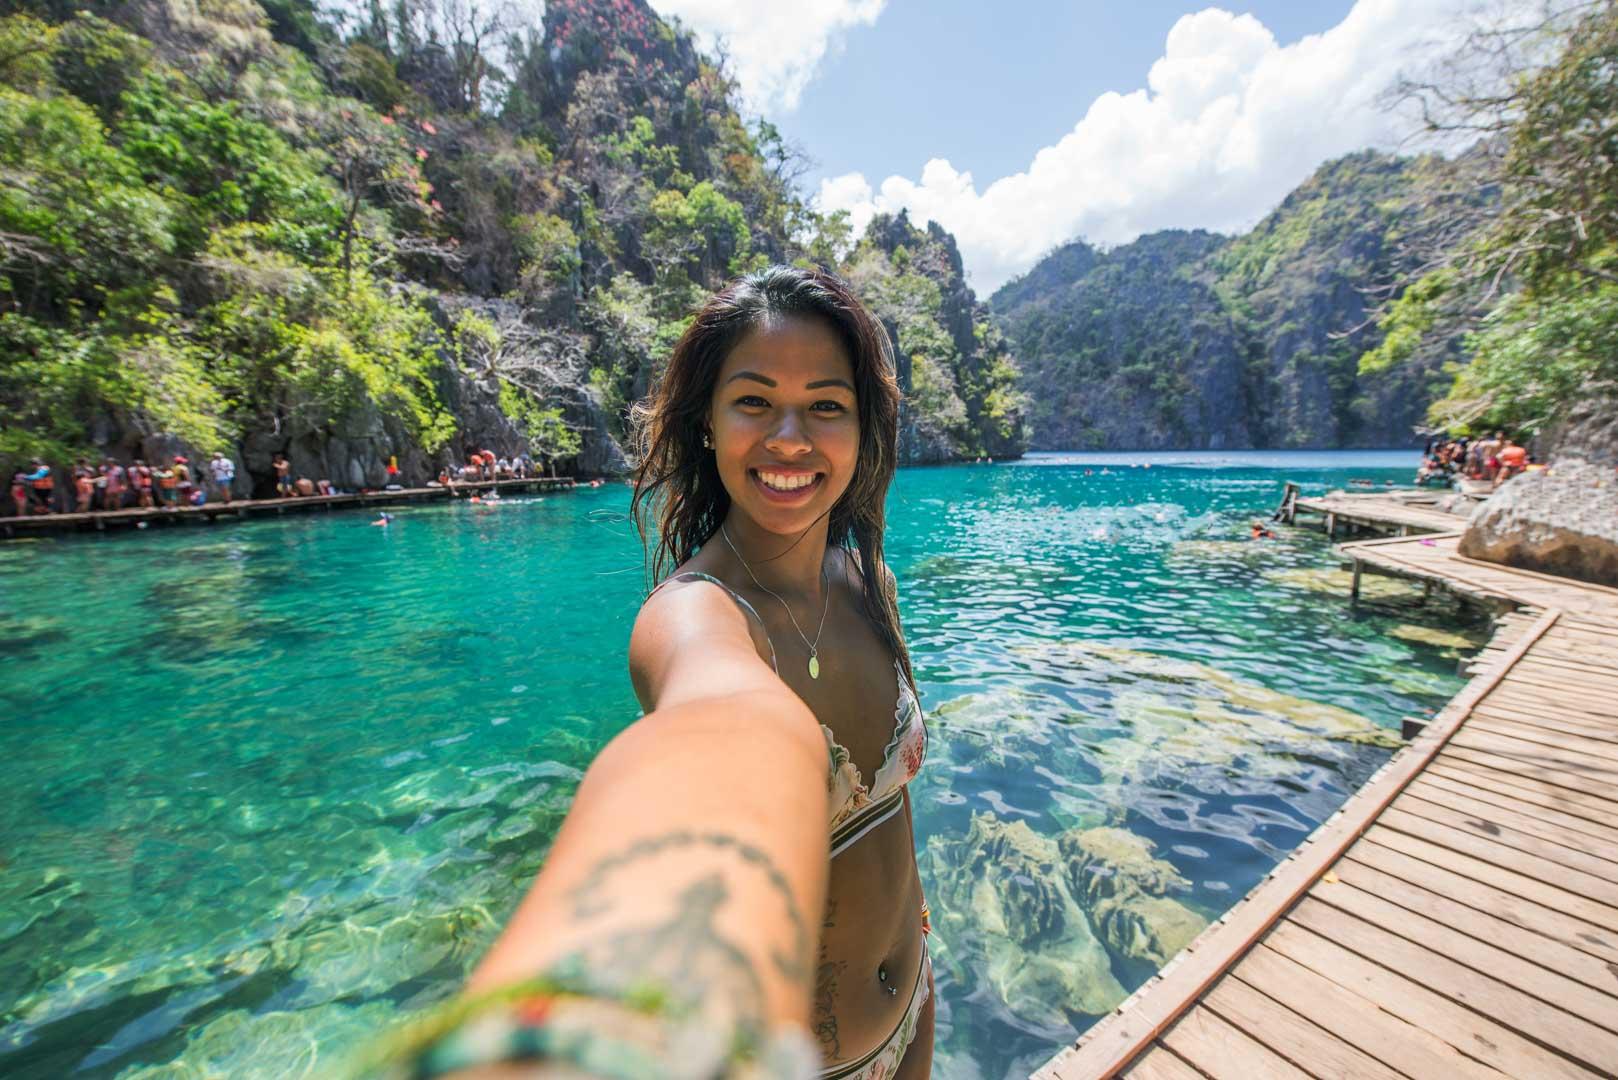 viajar-sudeste-asiatico